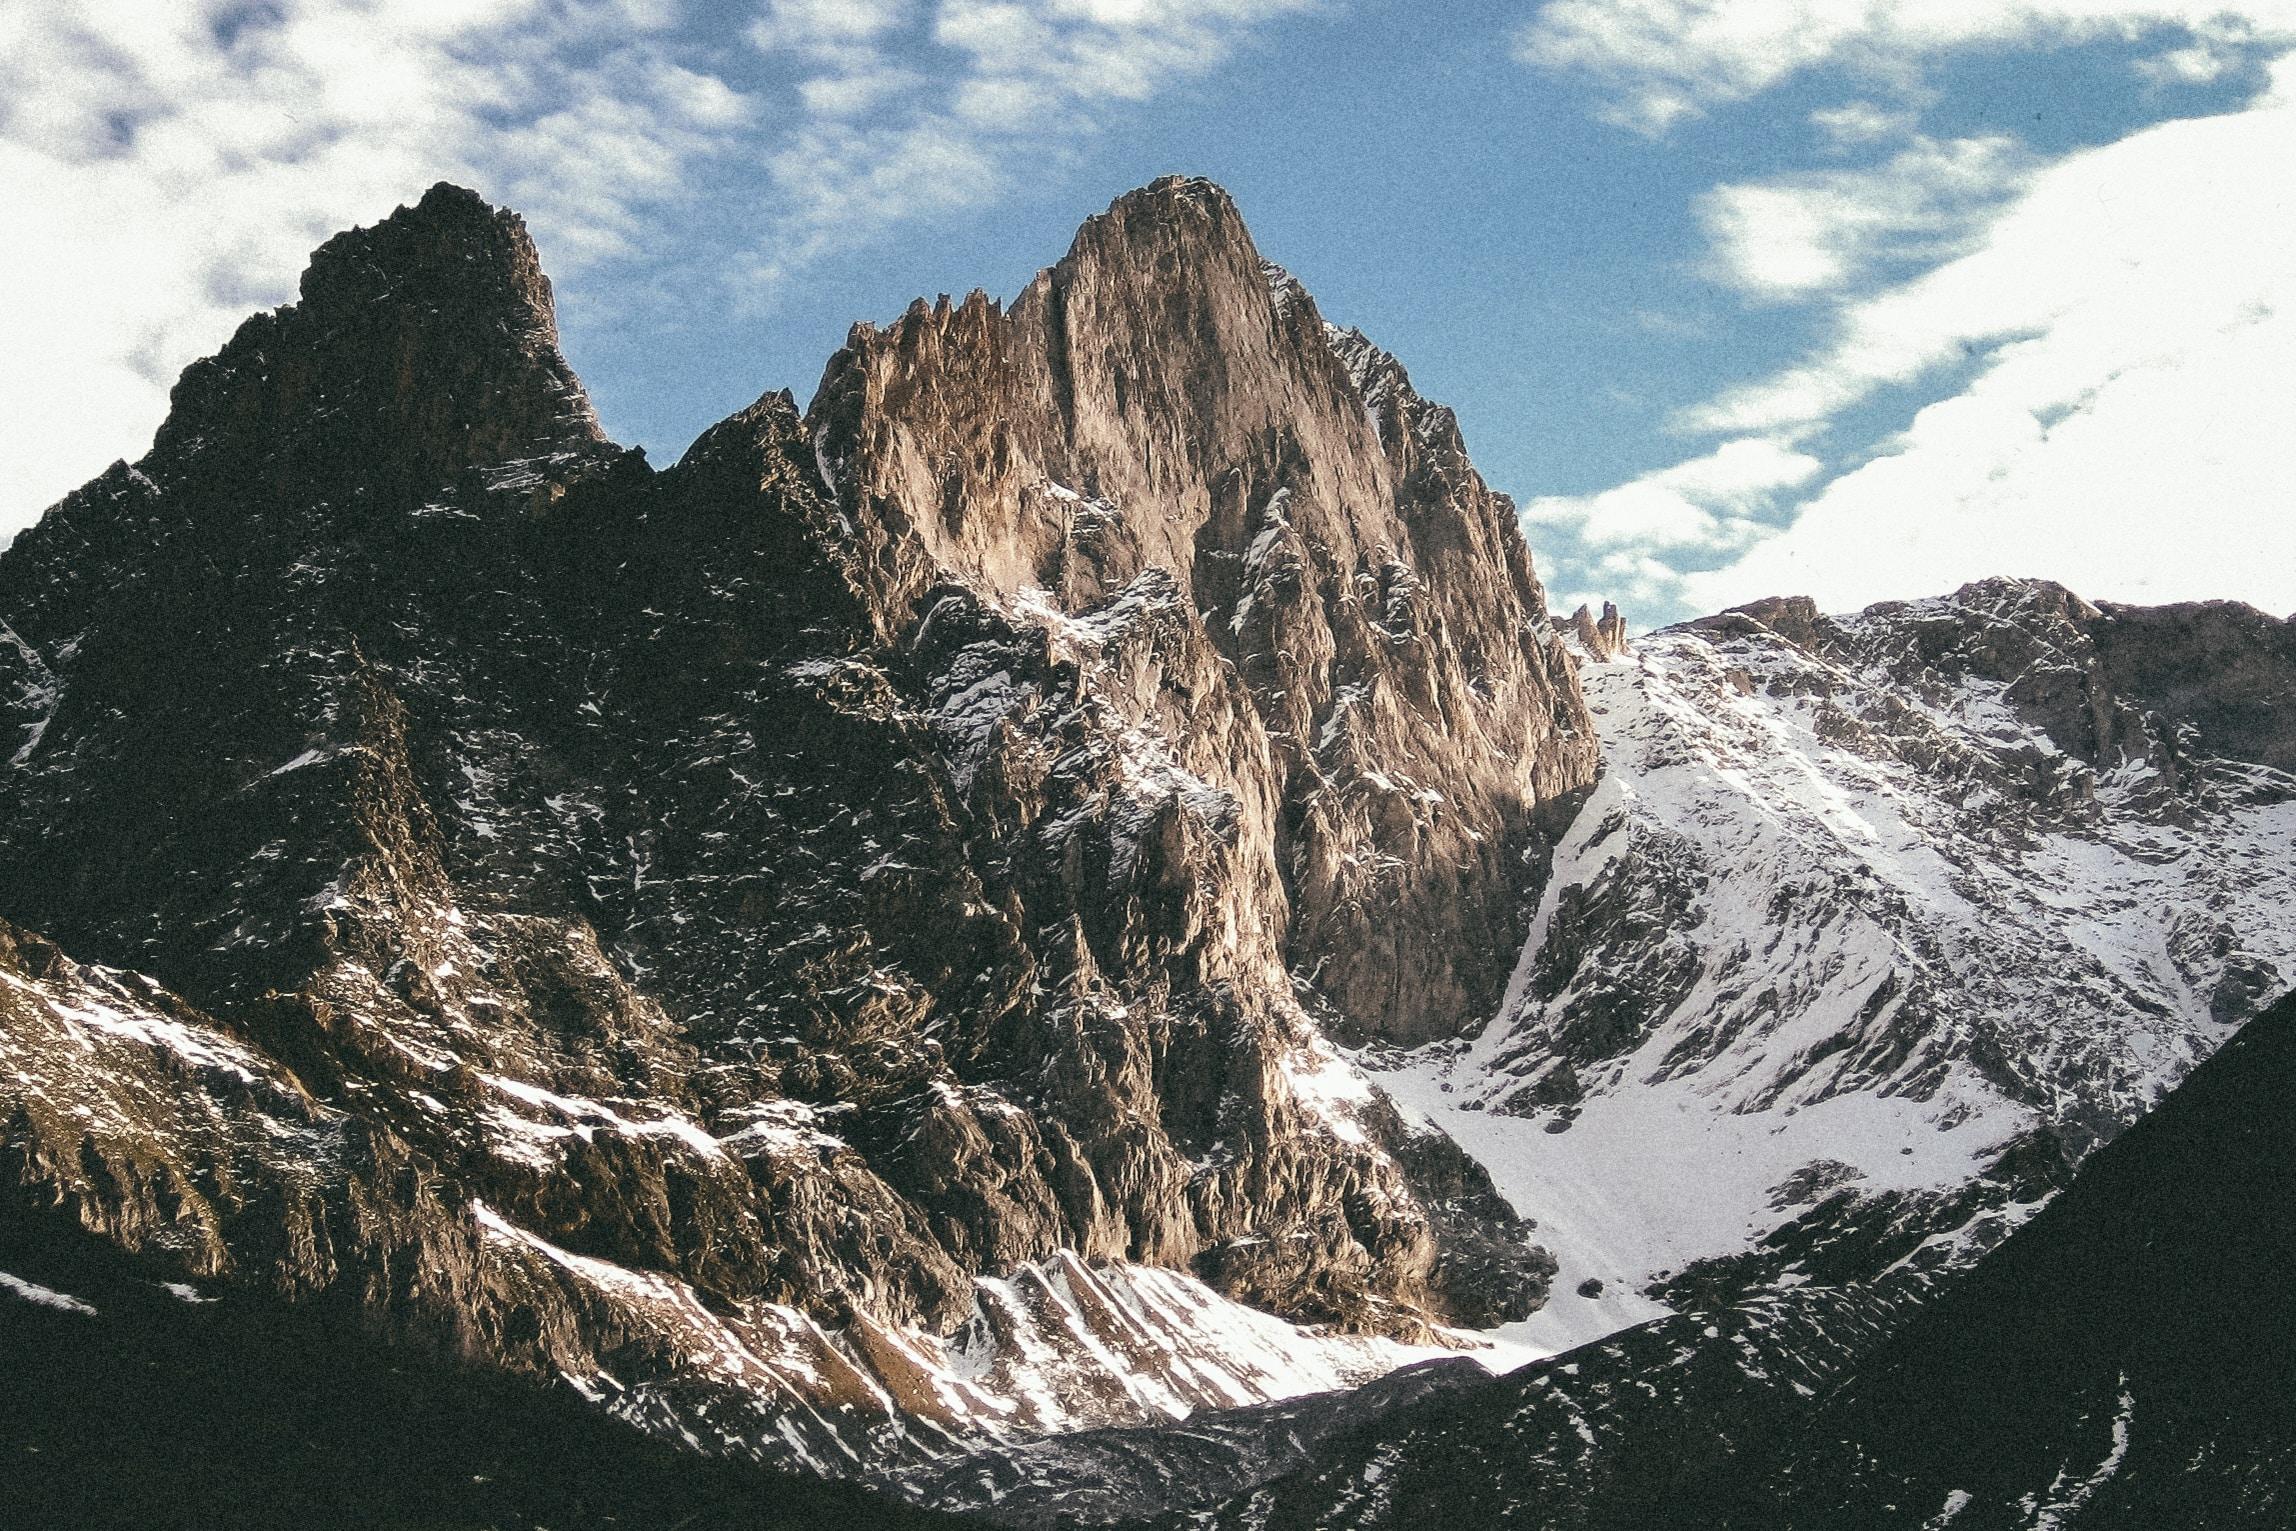 A steep granite ridge in Vanoise National Park